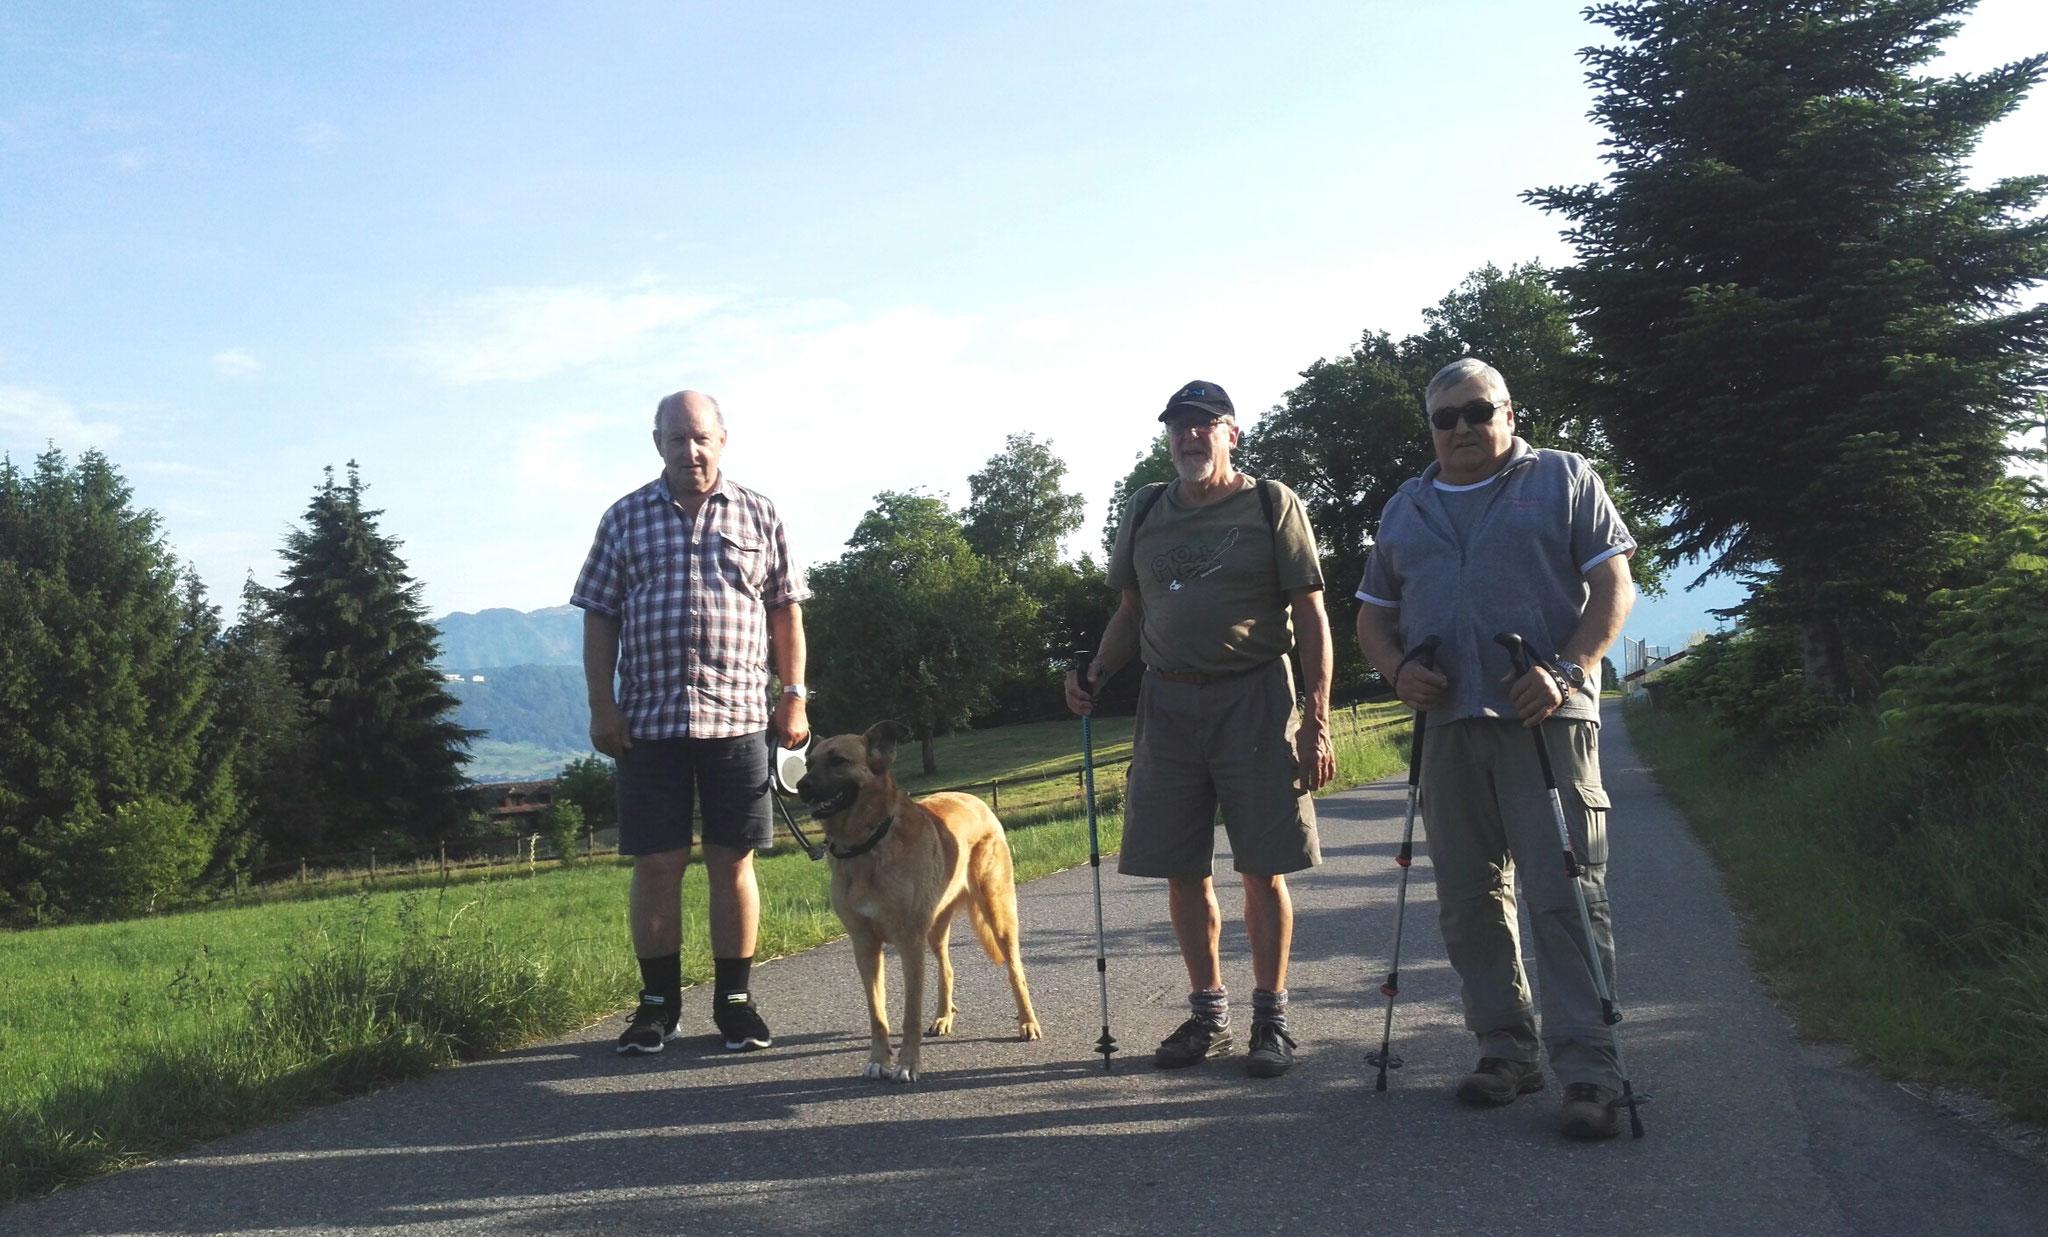 4 Turner mit Hundebegleitung